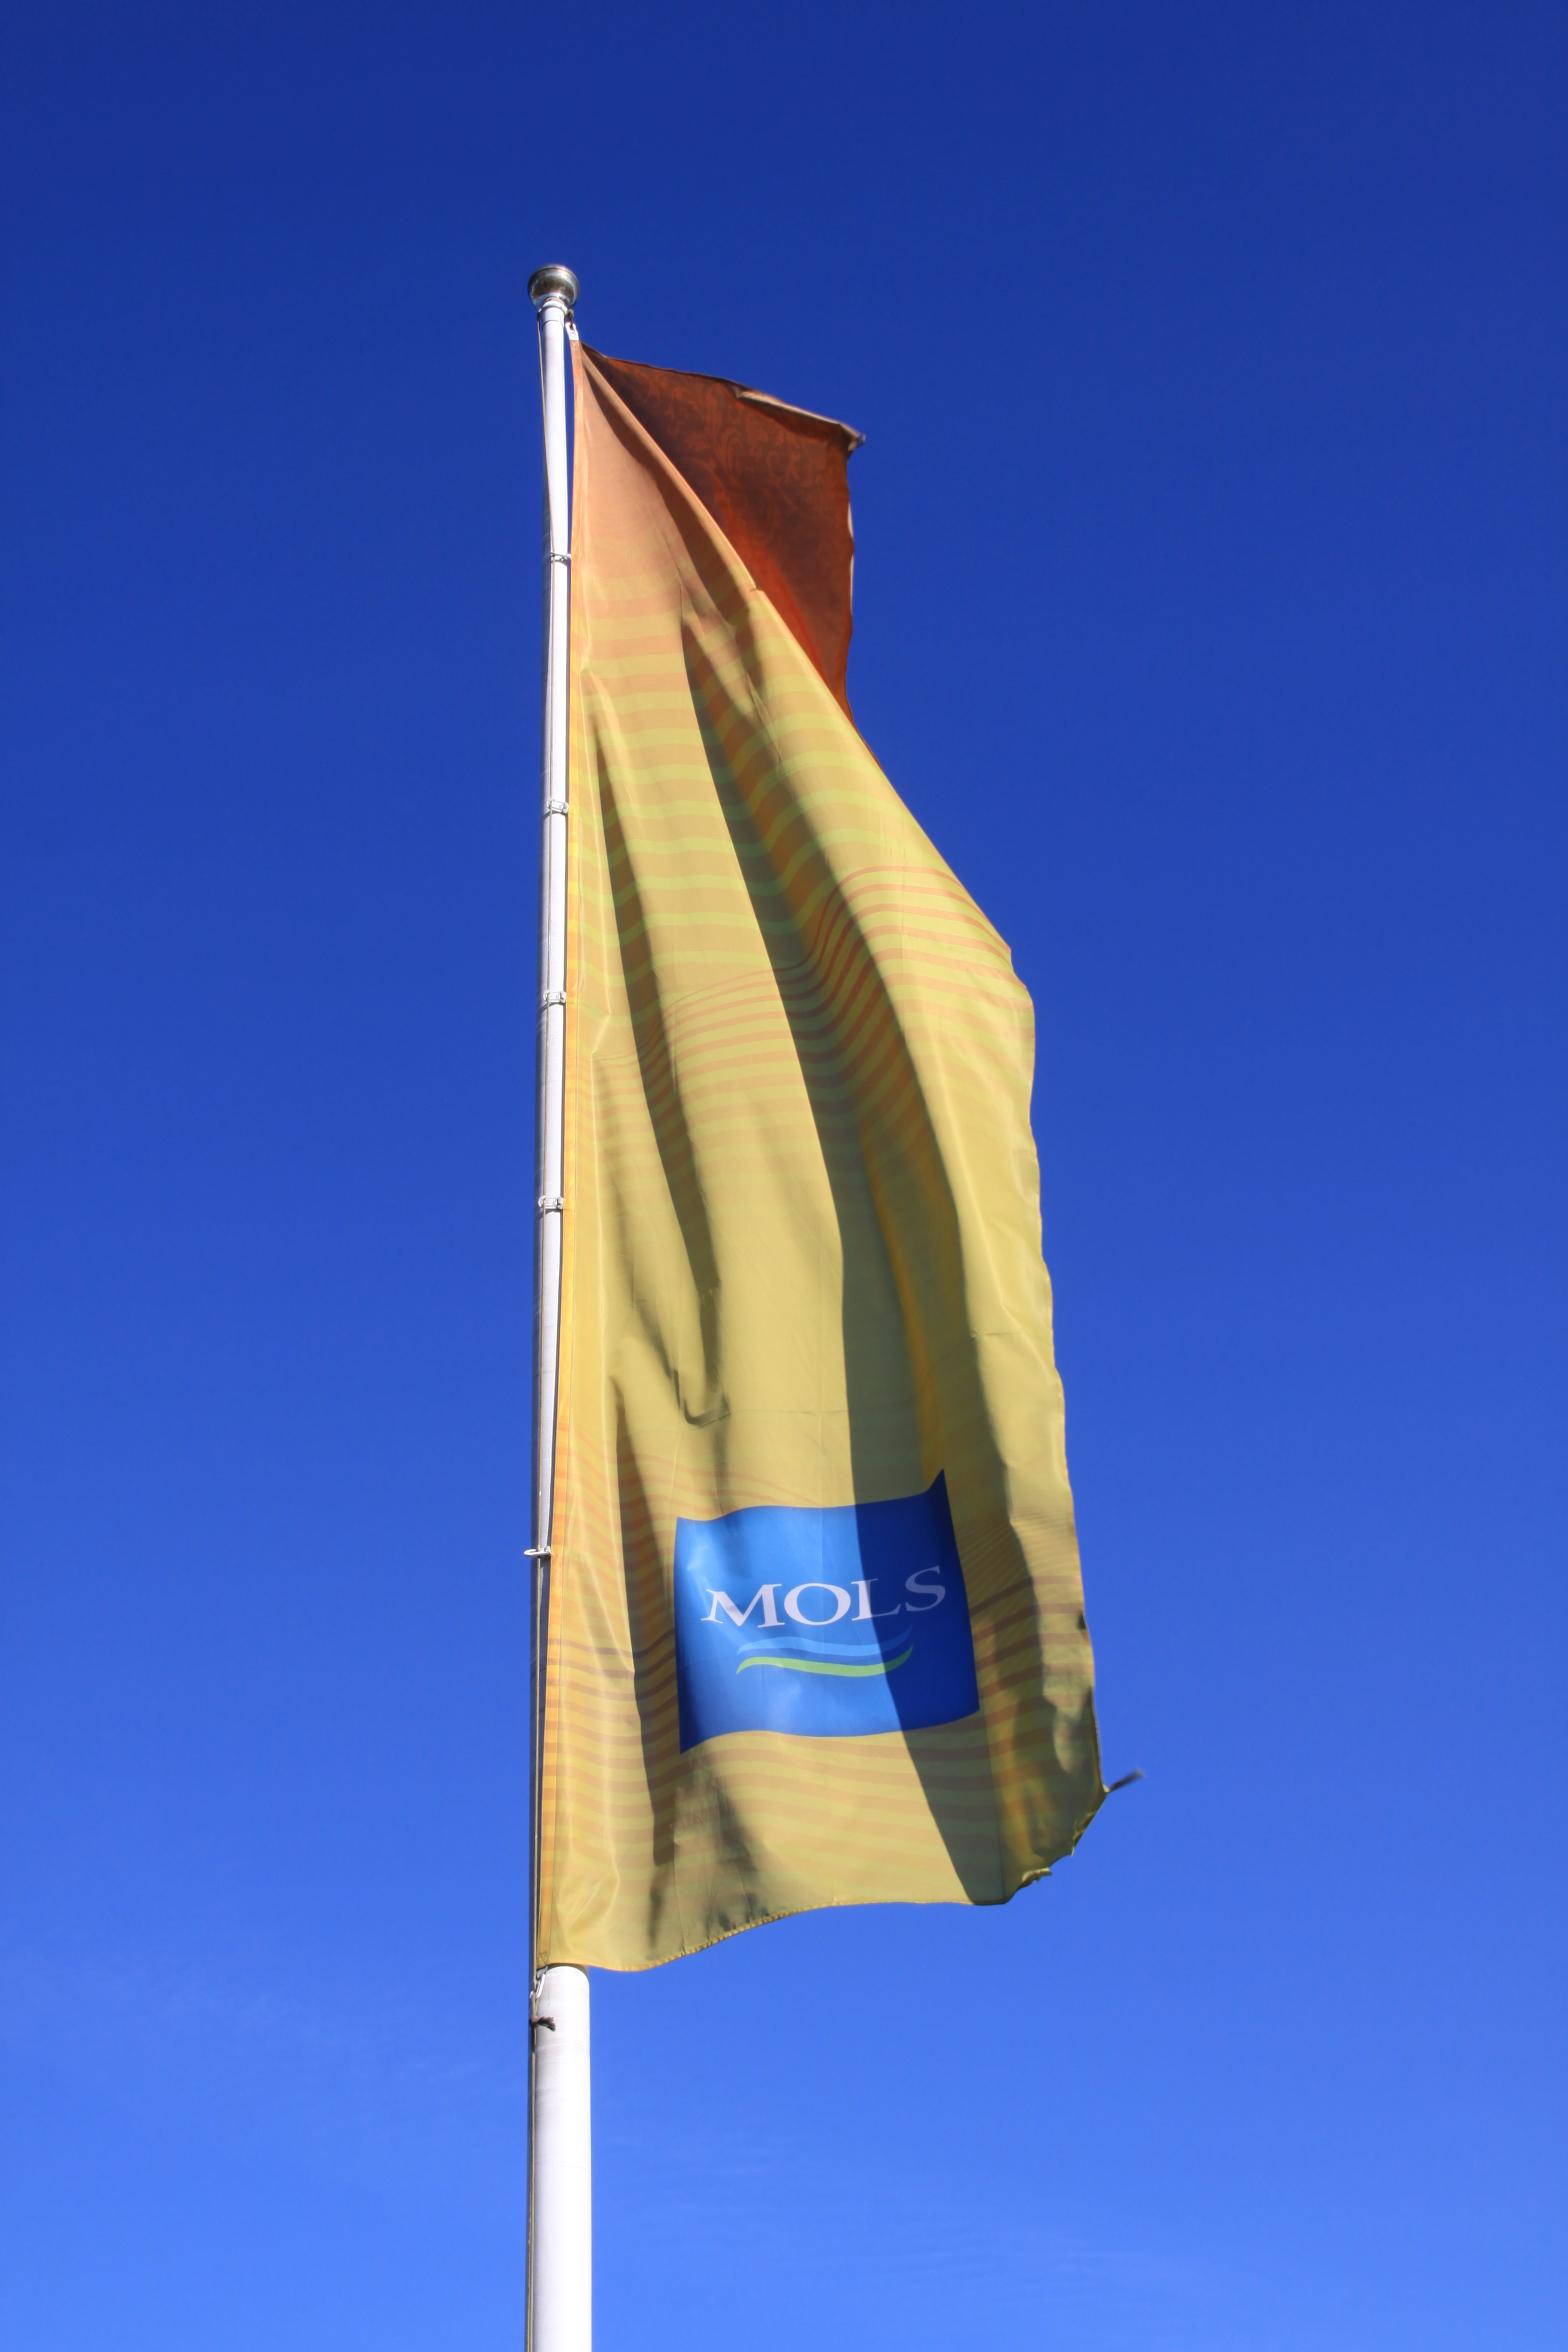 Mols, karogi, firmas karogs, flag, flags.